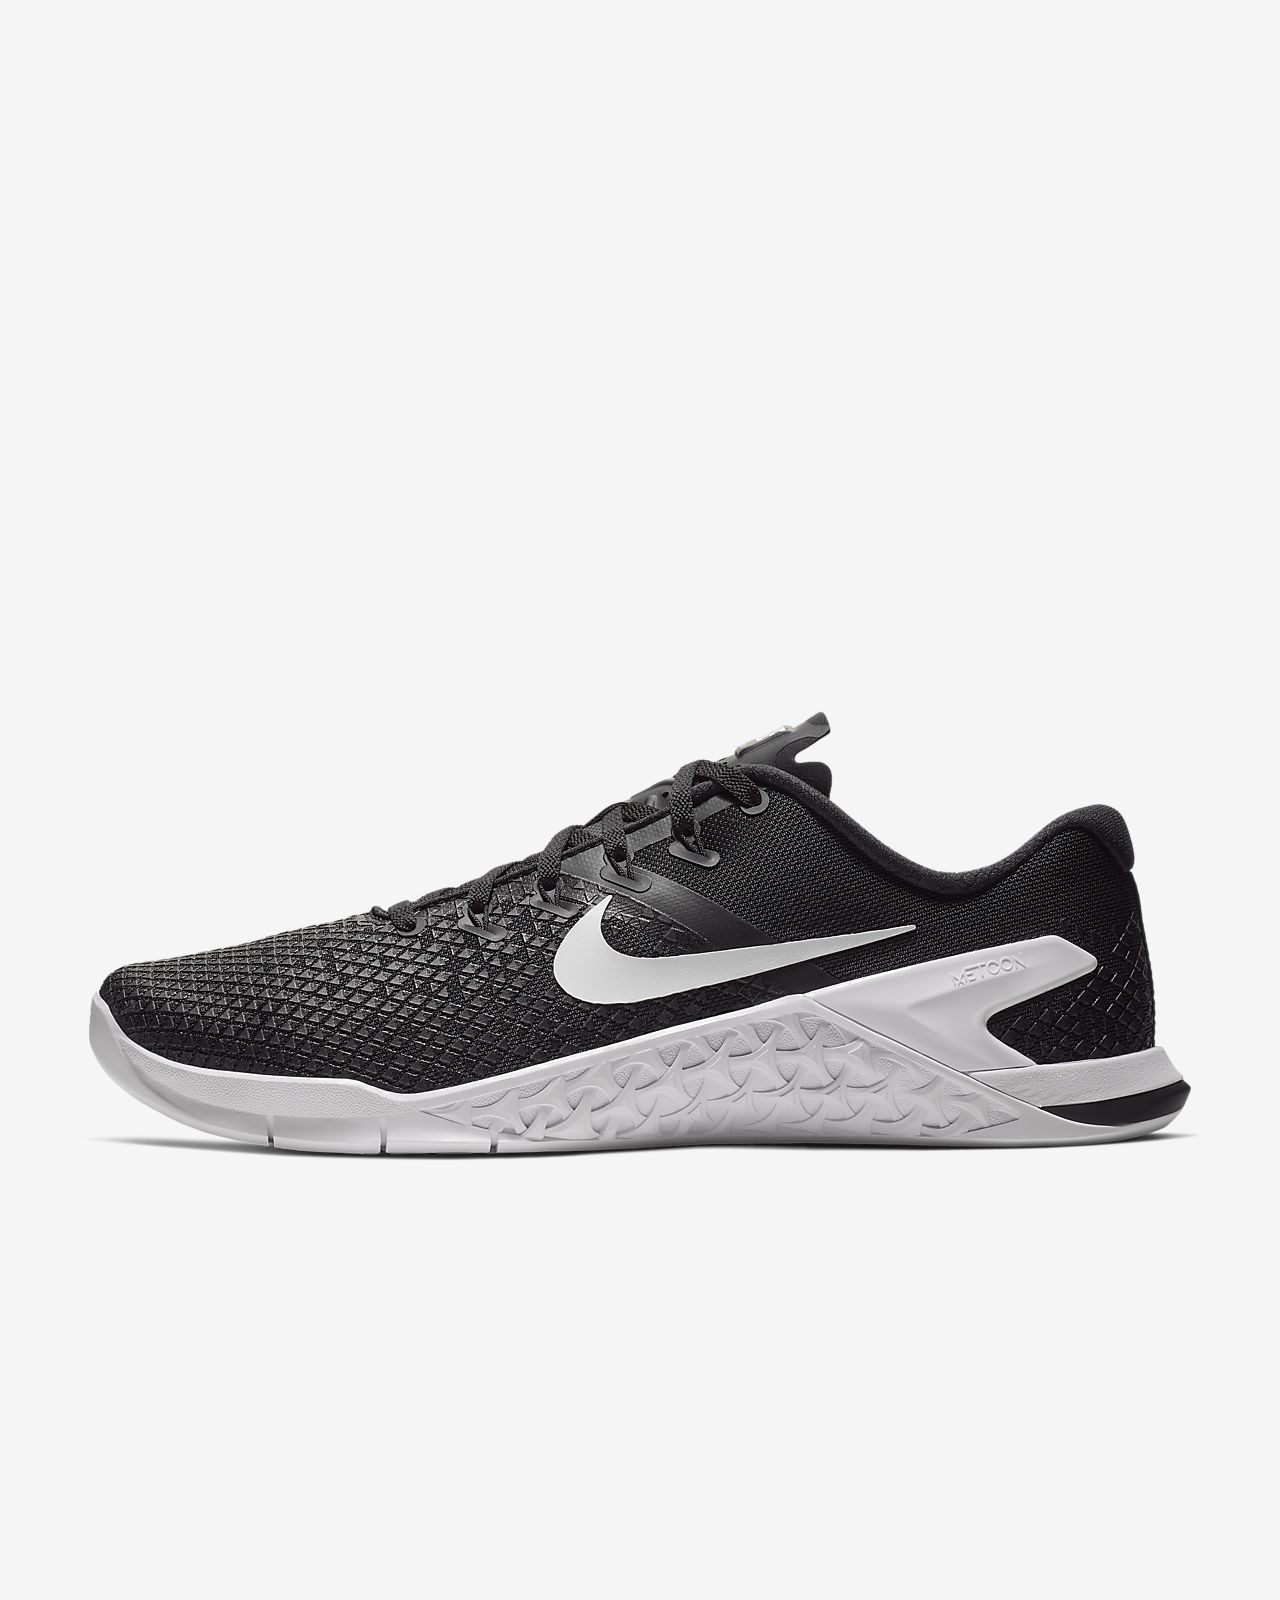 Nike Metcon 4 XD 男款訓練鞋